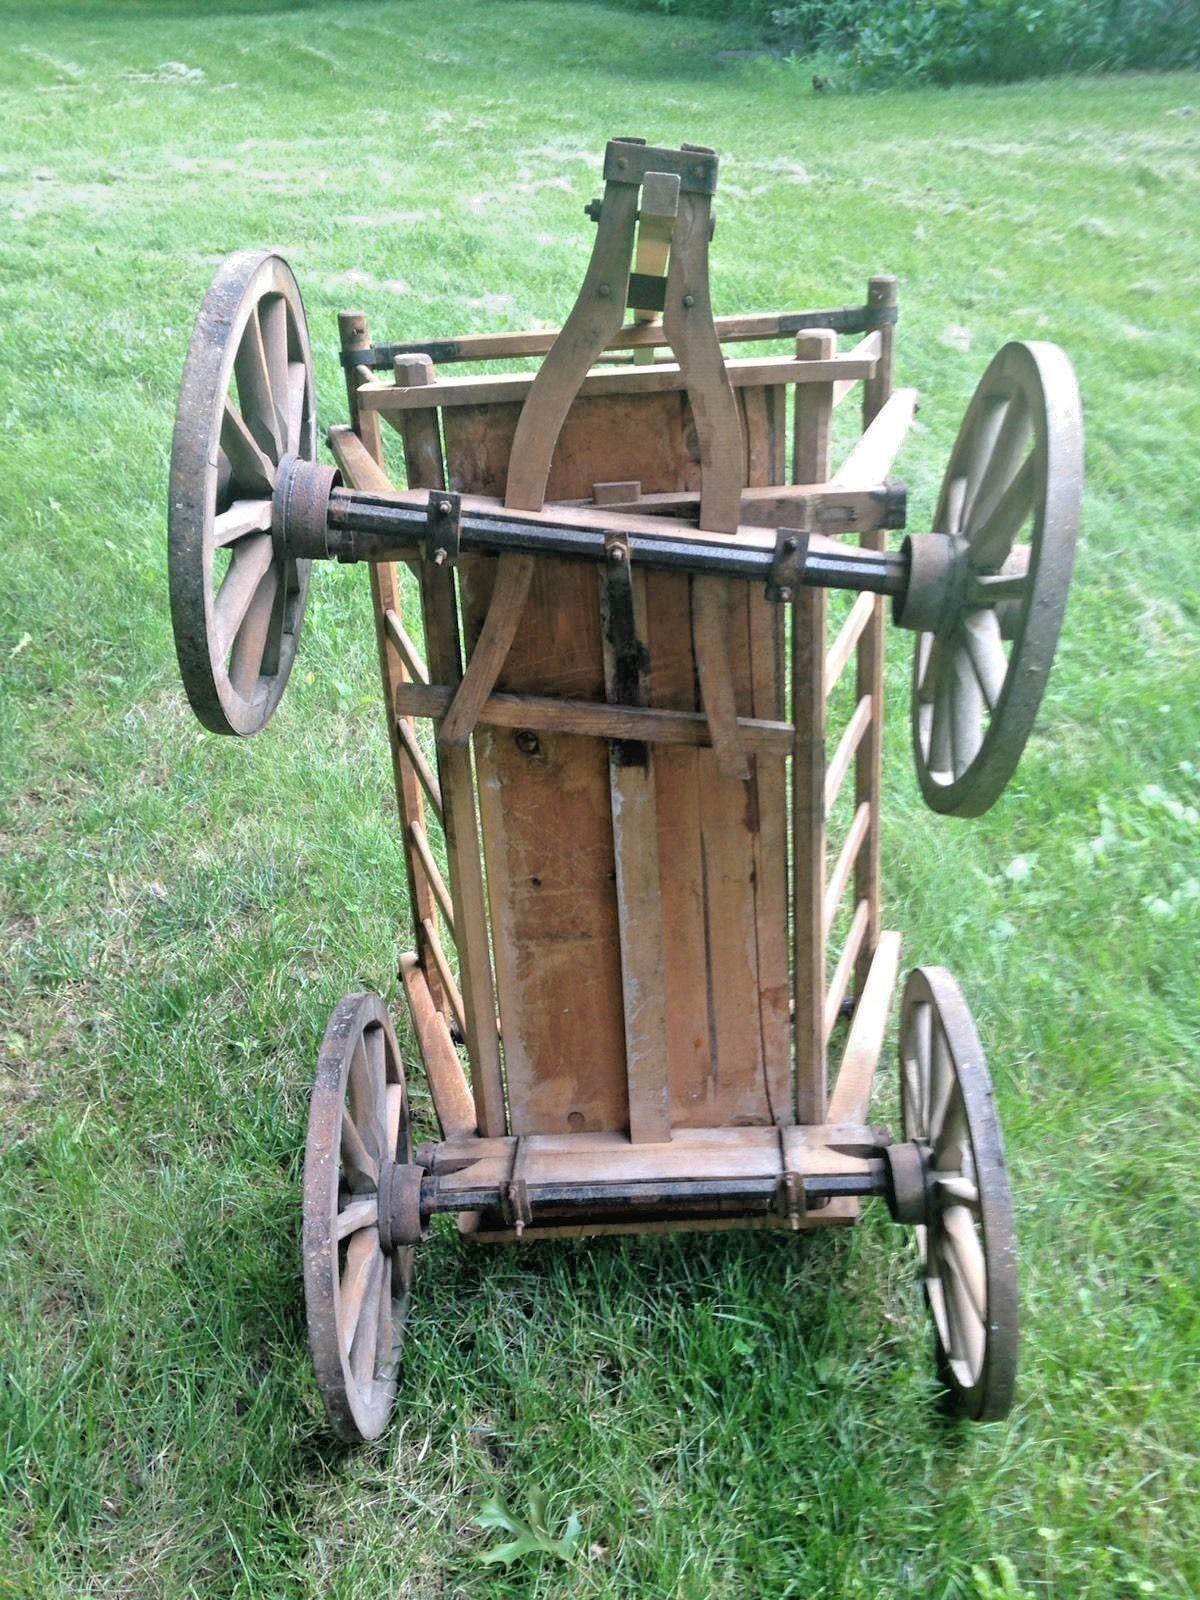 gardener wheels old cart the garden meditative